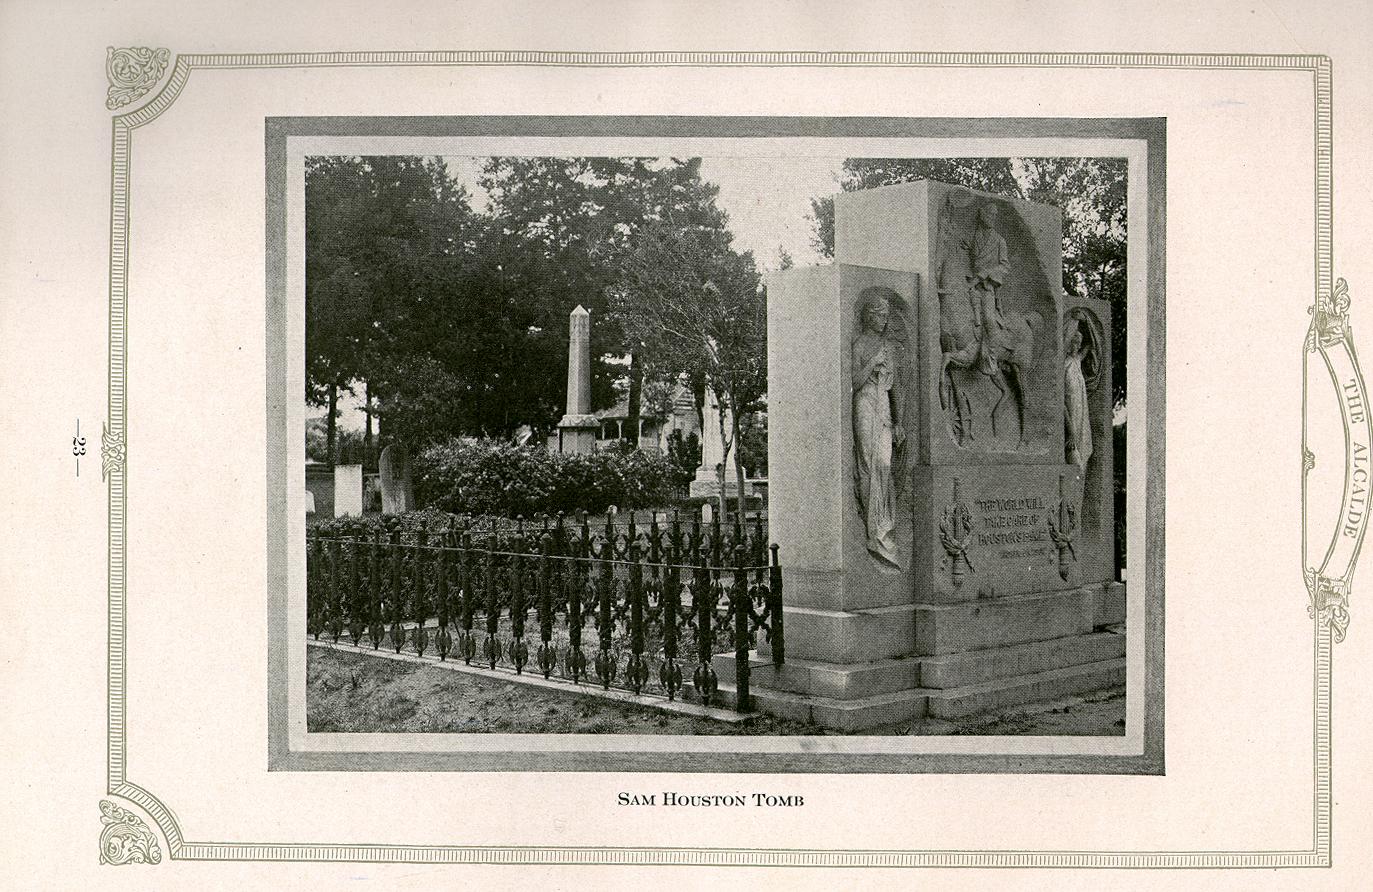 Sam Houston's tomb